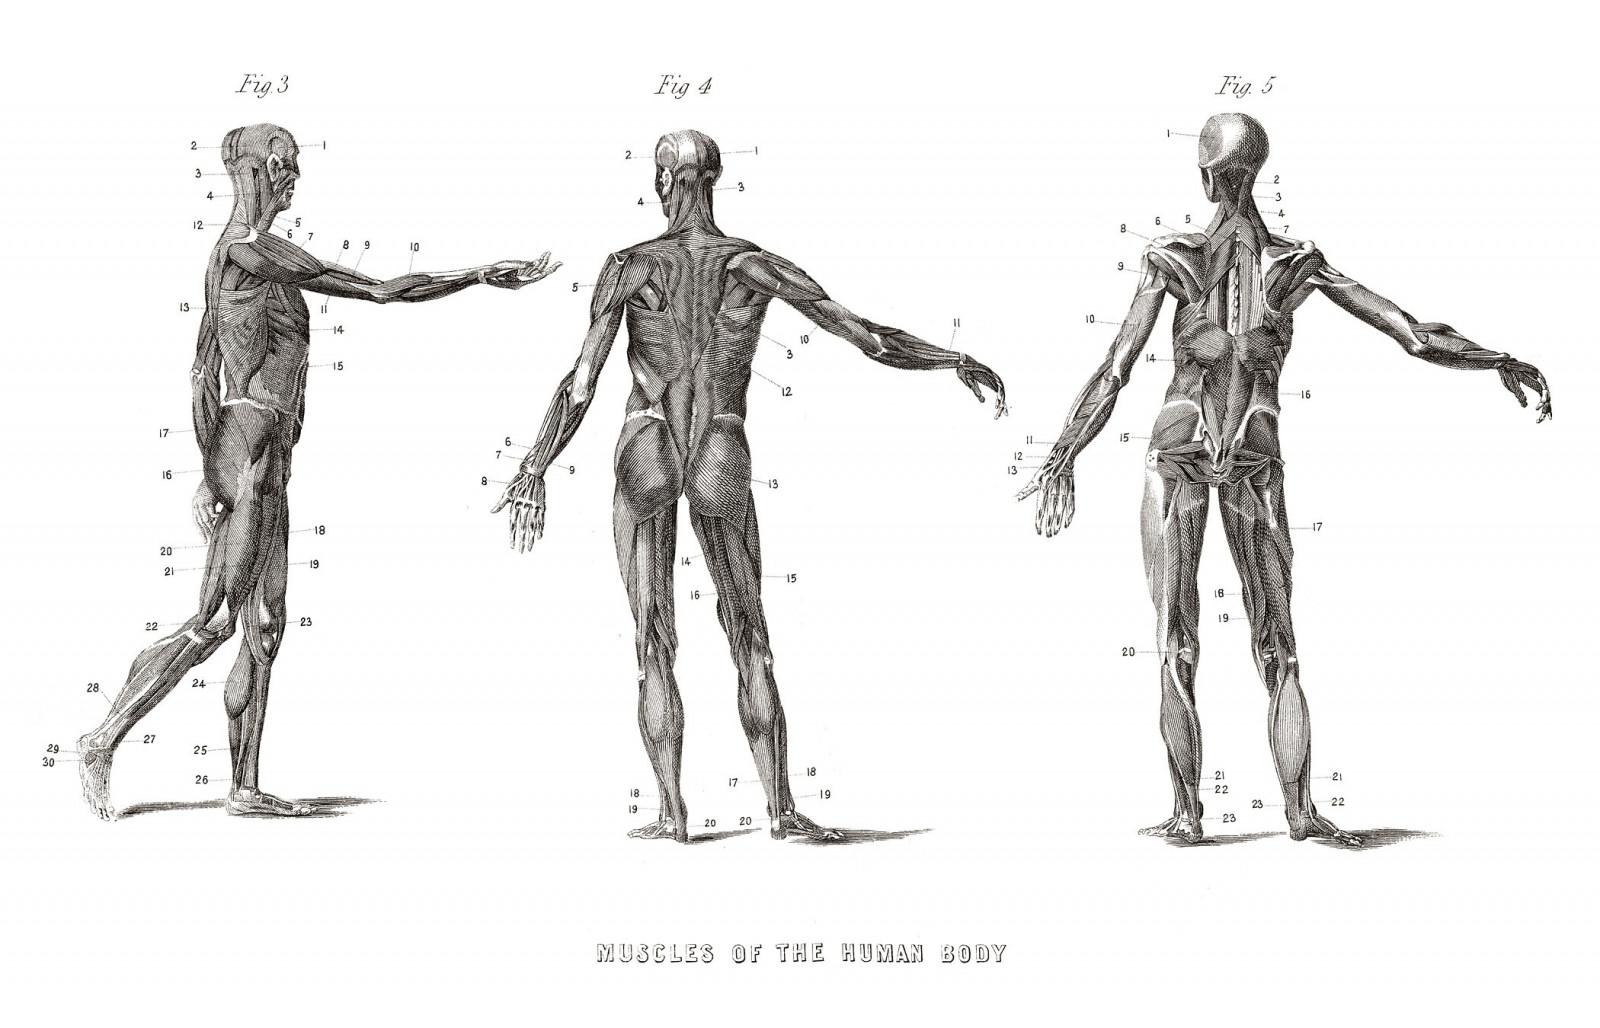 Hintergrundbilder : Illustration, Karikatur, Wissenschaft, Skelett ...